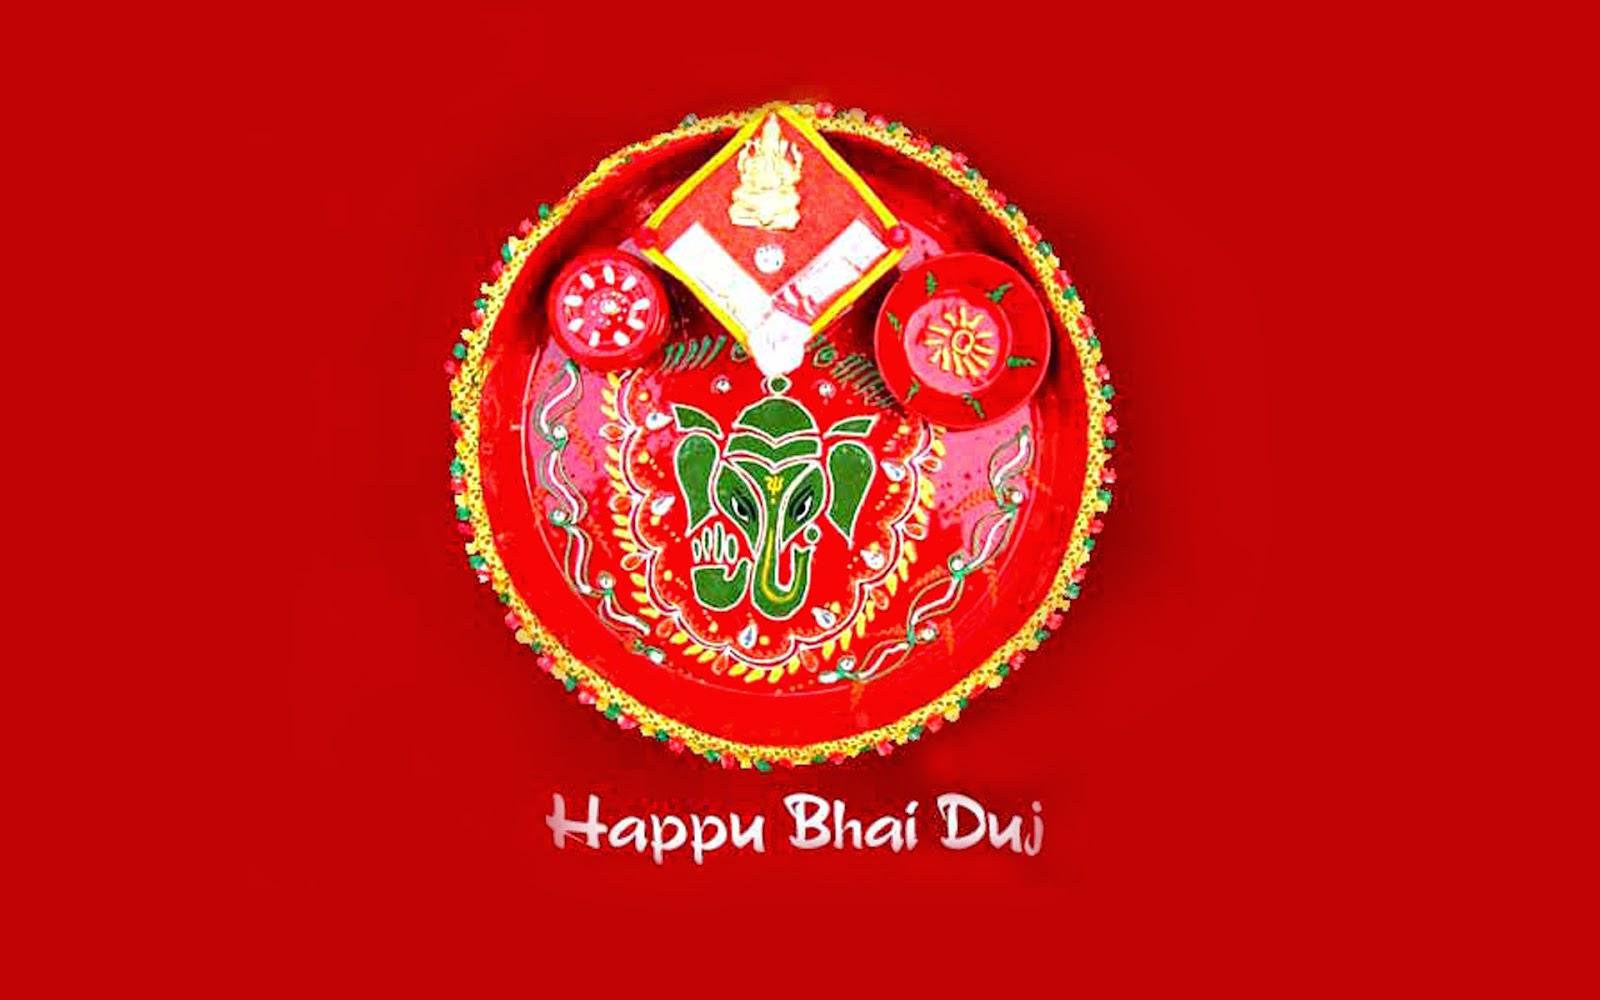 Bhai Dooj Celebration Red Wallpaper